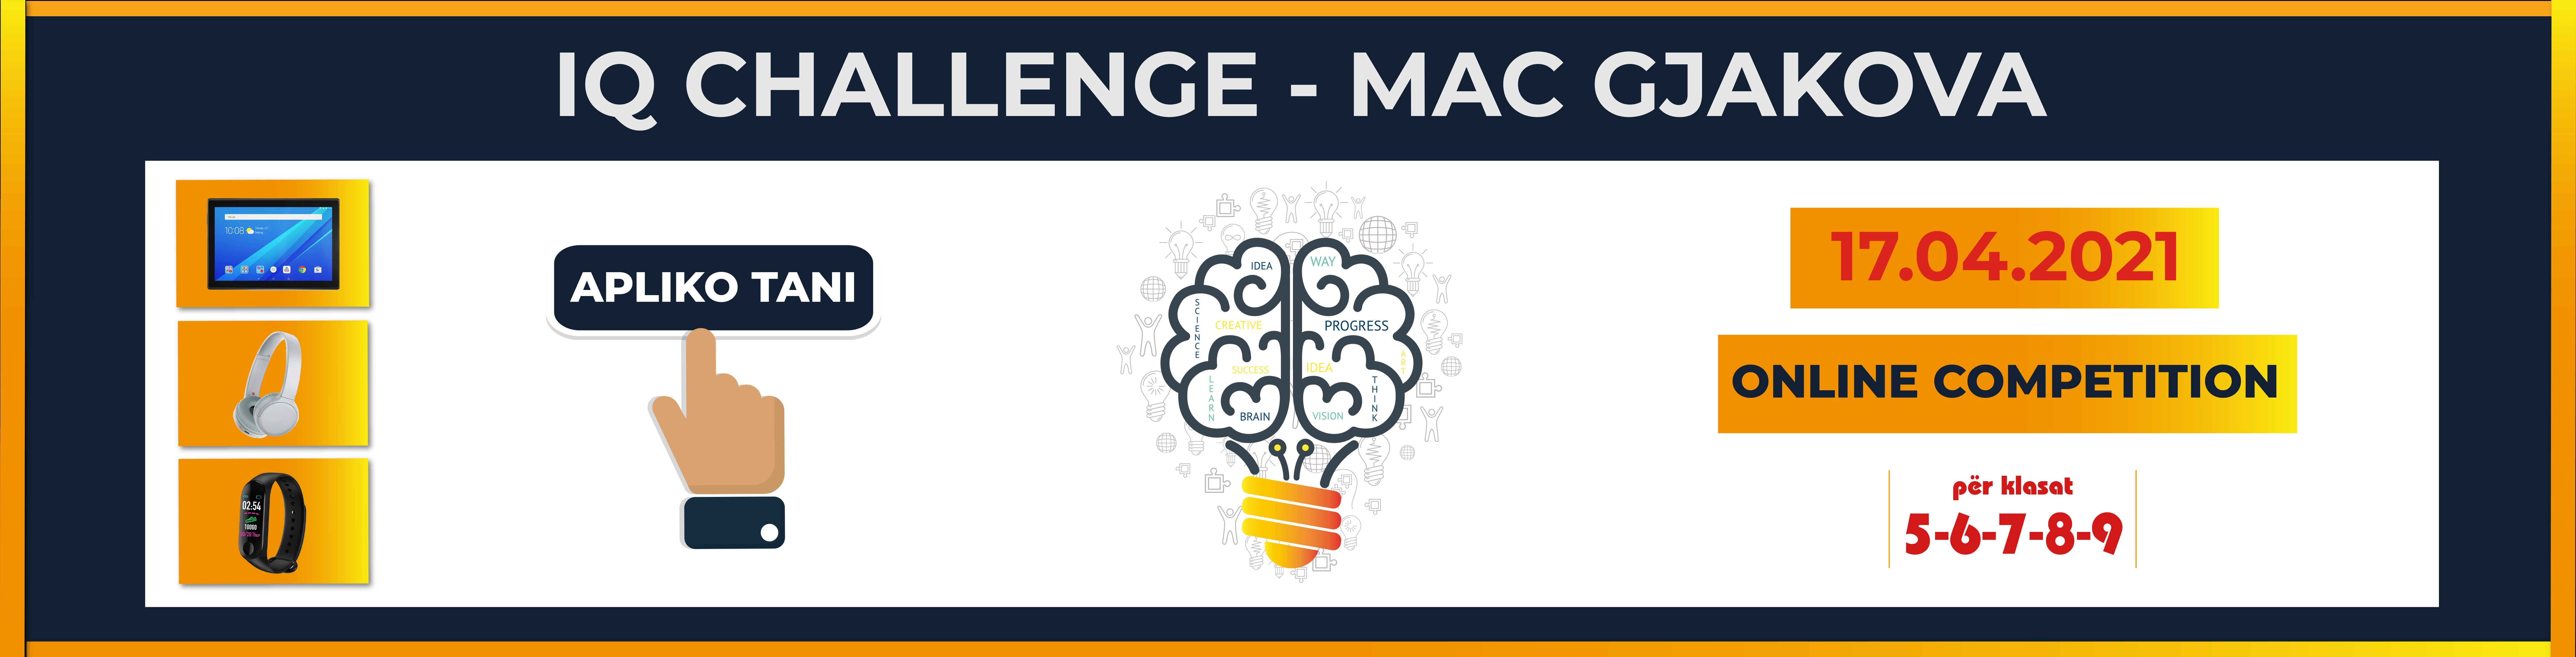 Apply for IQ CHALLENGE – MAC GJAKOVA